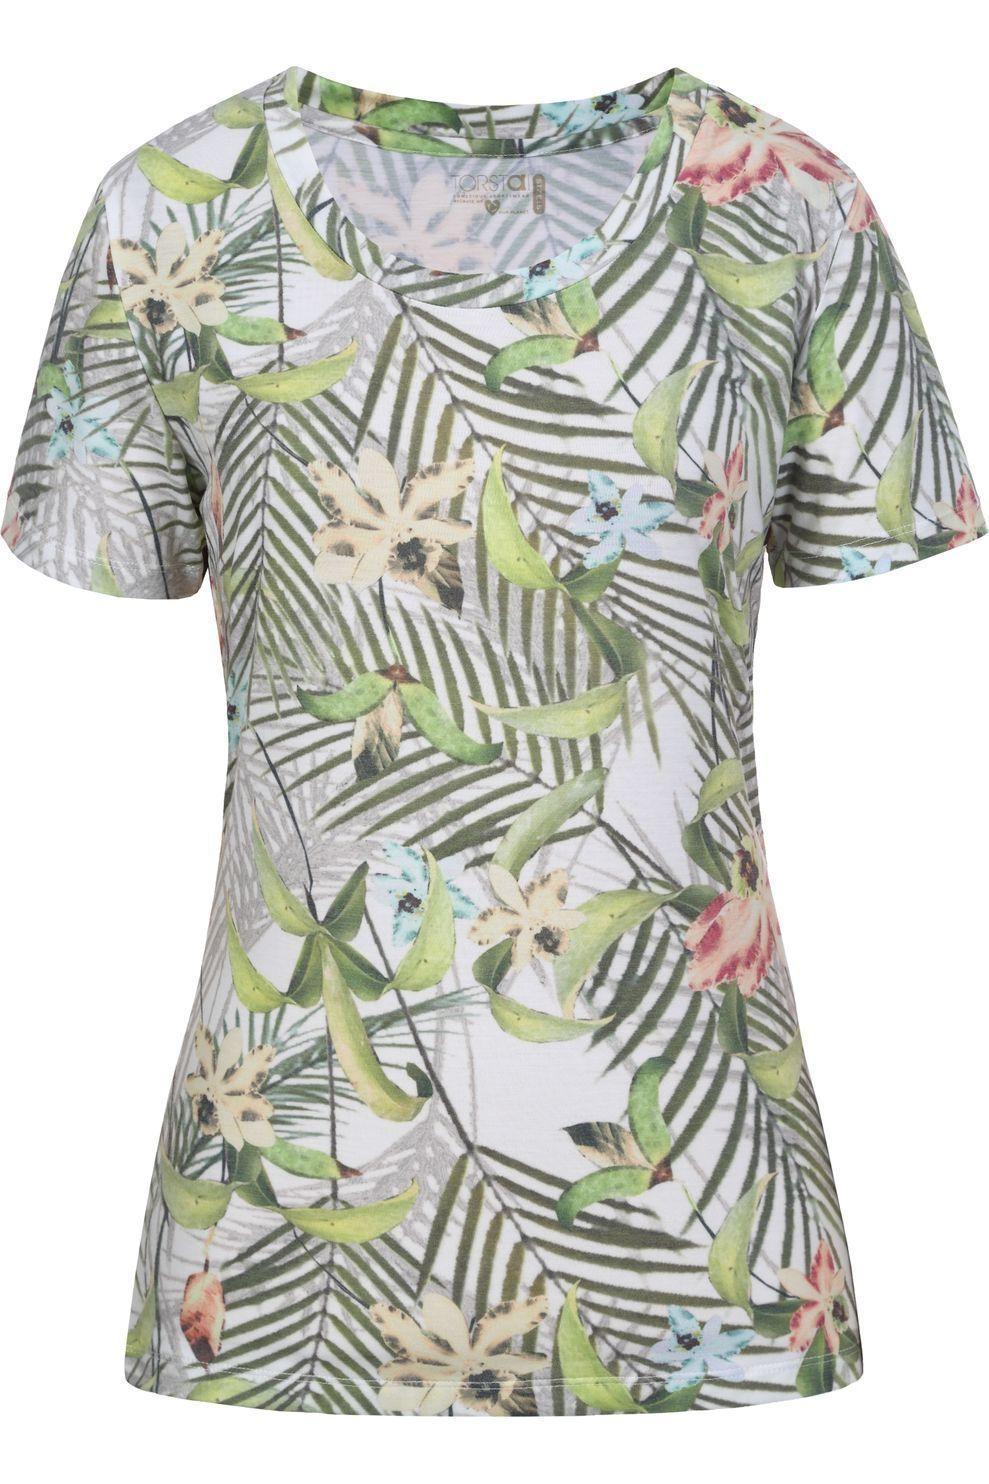 Torstai T-Shirt Mirissa voor dames - Wit - Maten: S, M, L, XL